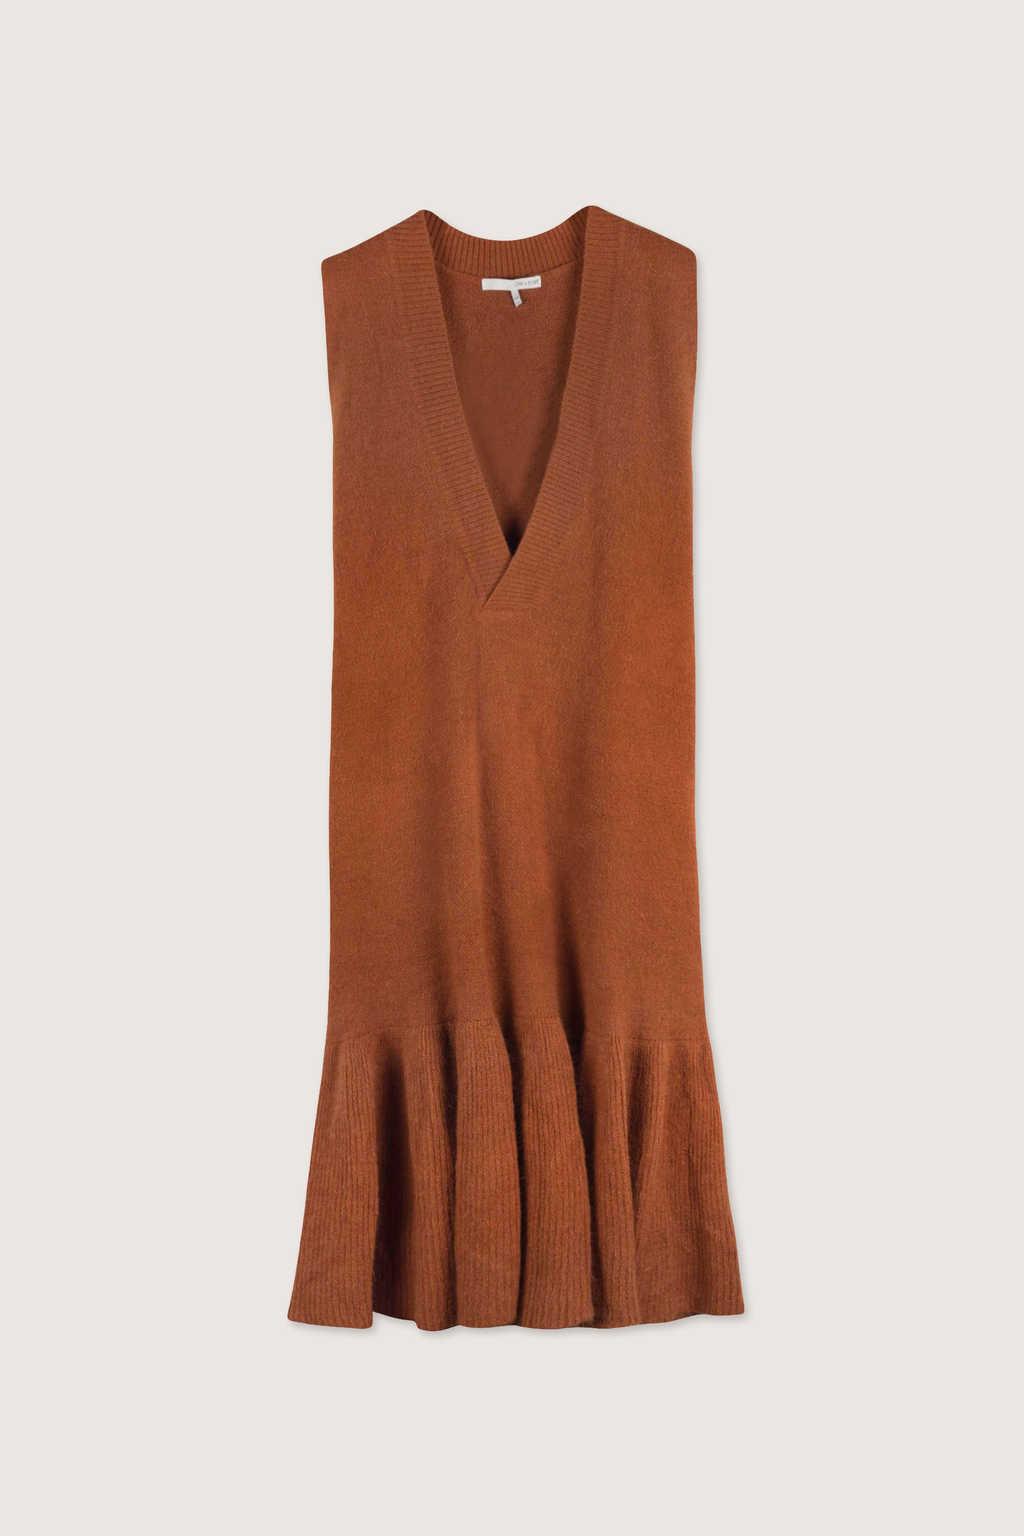 Dress H292 Brown 5